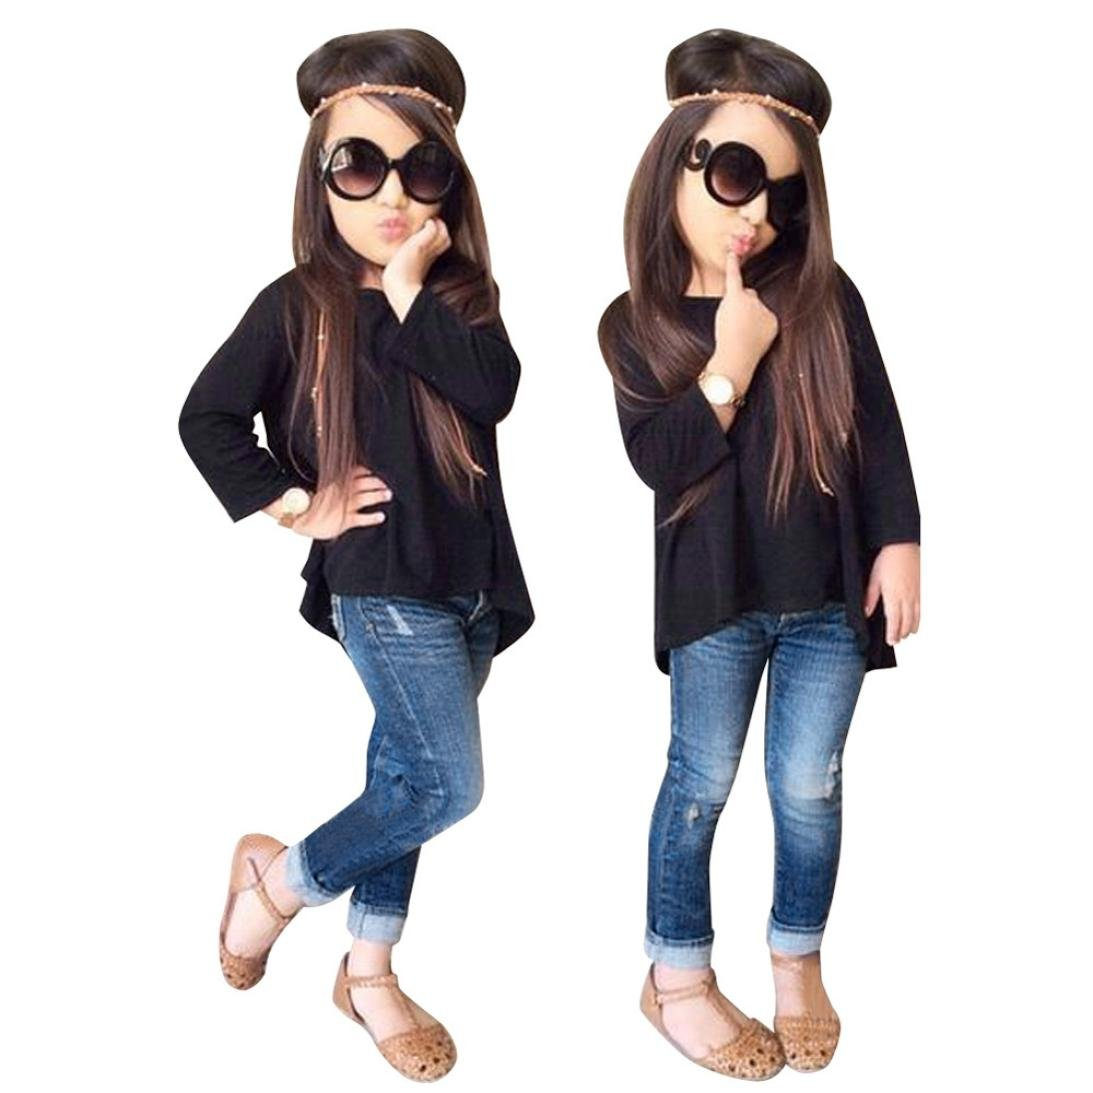 a9c6f3f583b TiTCool Toddler Girls Outfit Fashion Pant Set Clothes T-Shirt Tops+Jeans  Pants 2Pcs